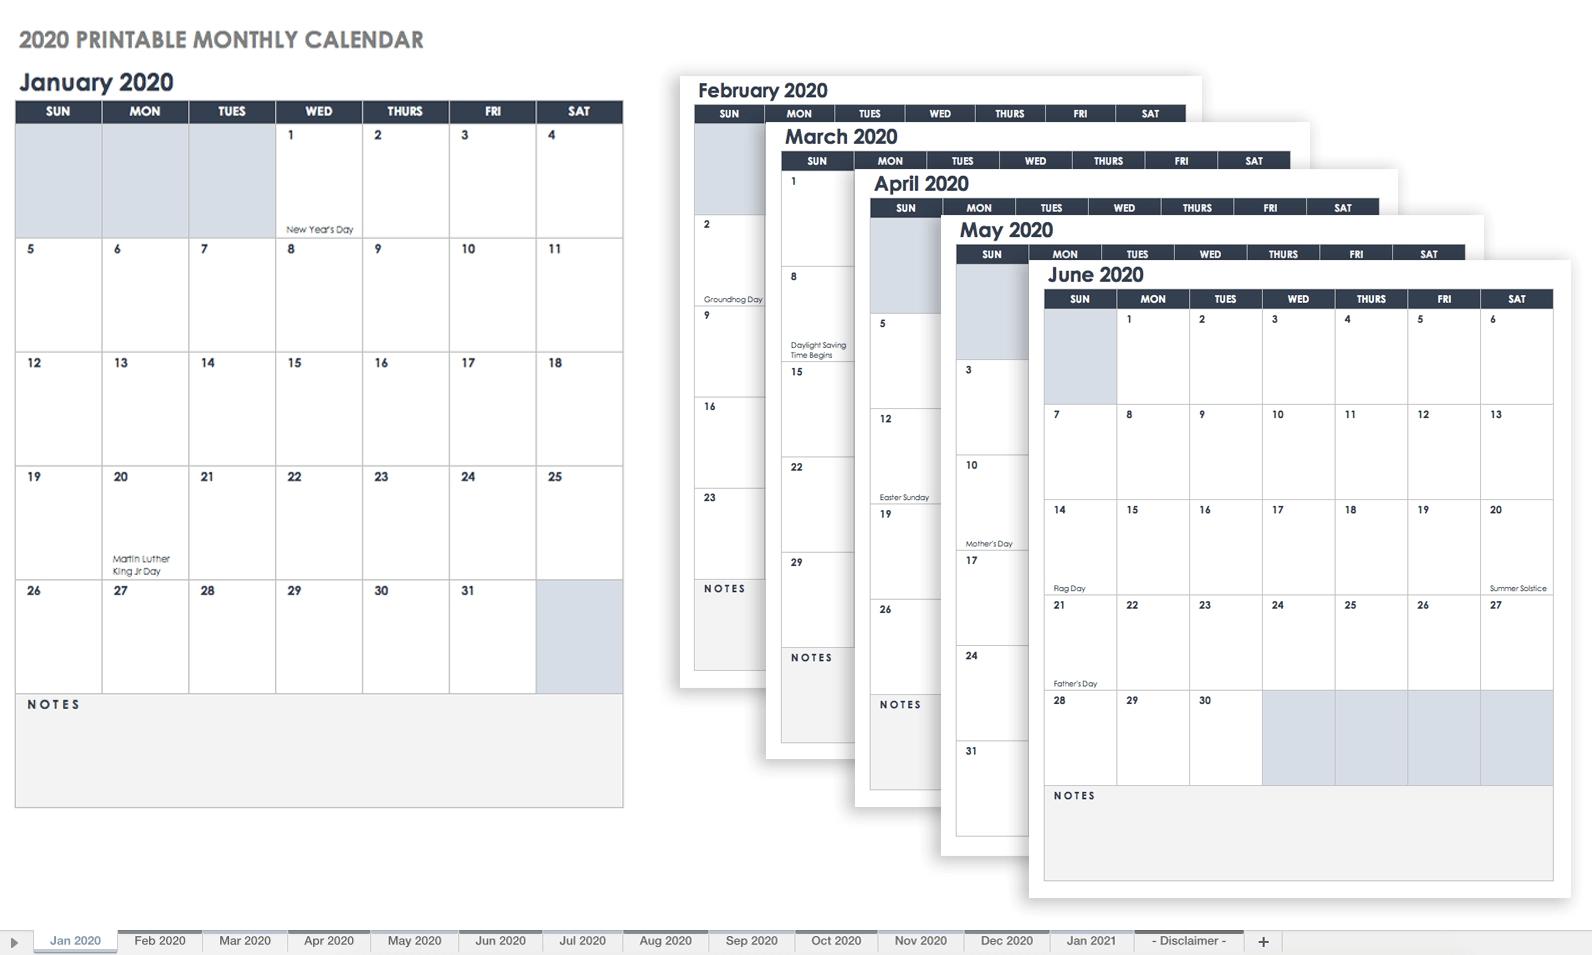 Free Blank Calendar Templates - Smartsheet-4 Month Planner Template